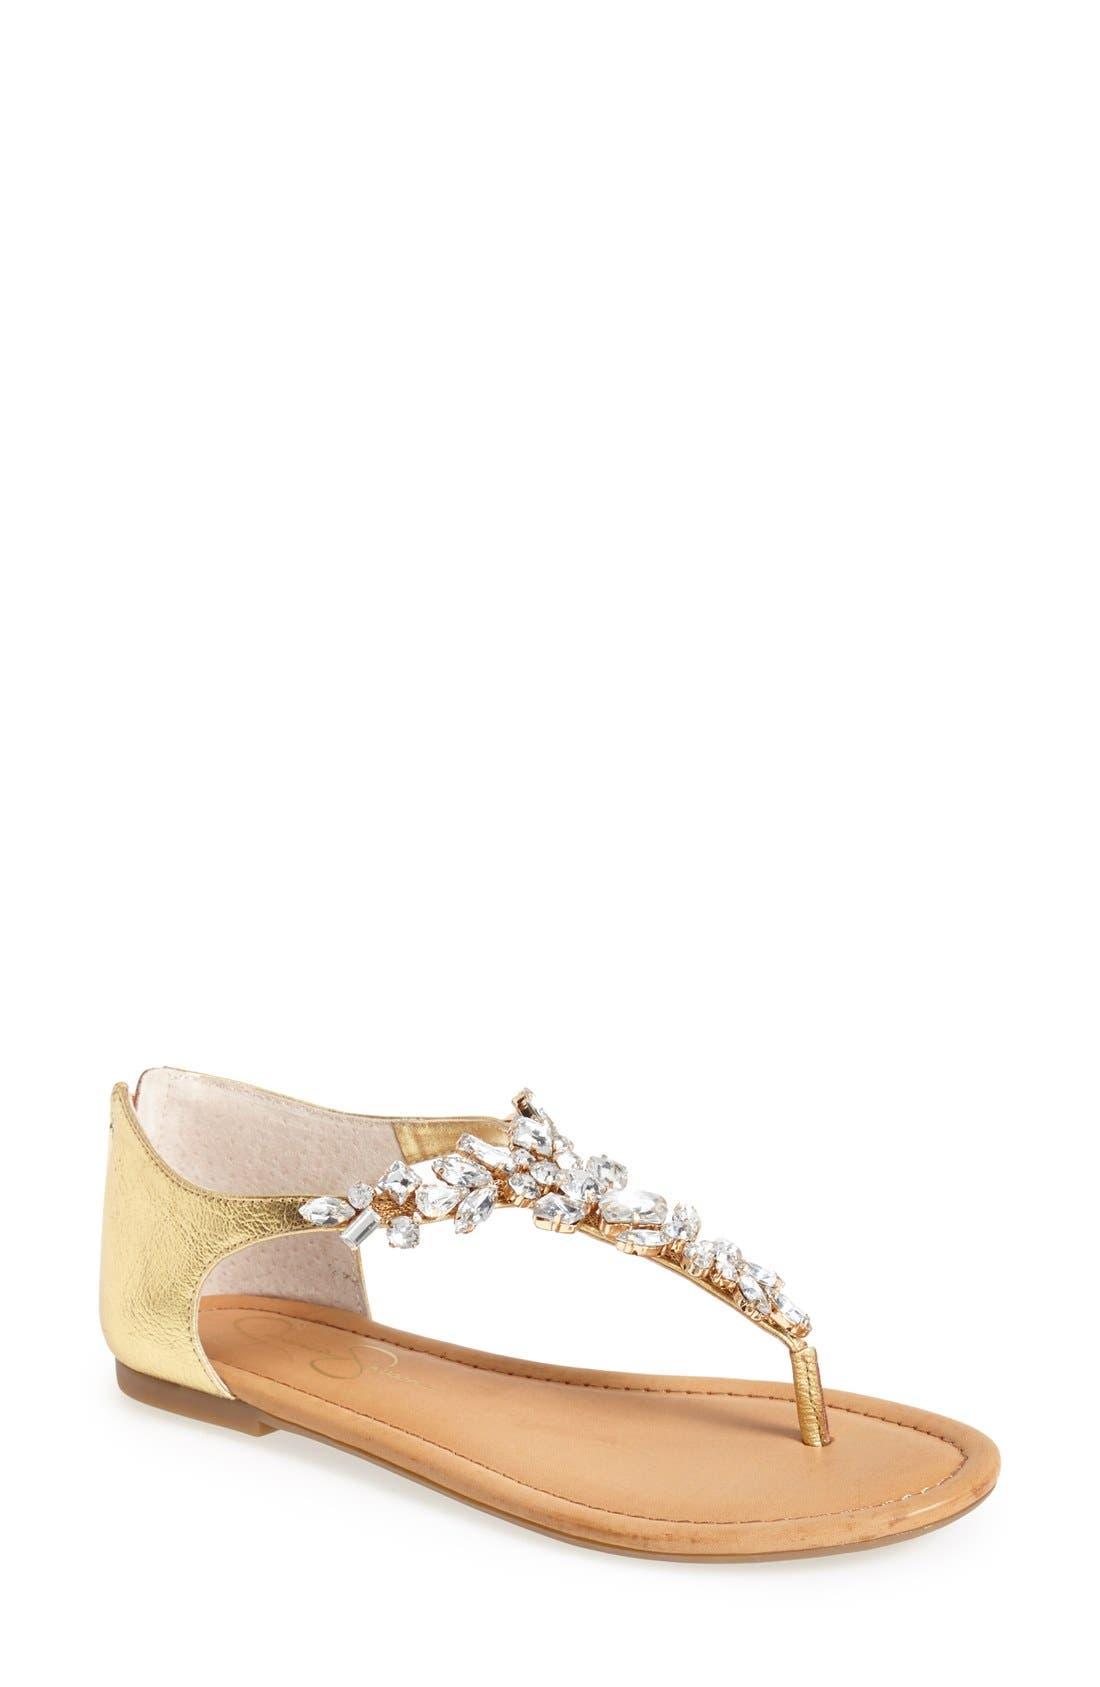 Main Image - Jessica Simpson 'Radient' Crystal Embellished Sandal (Women)